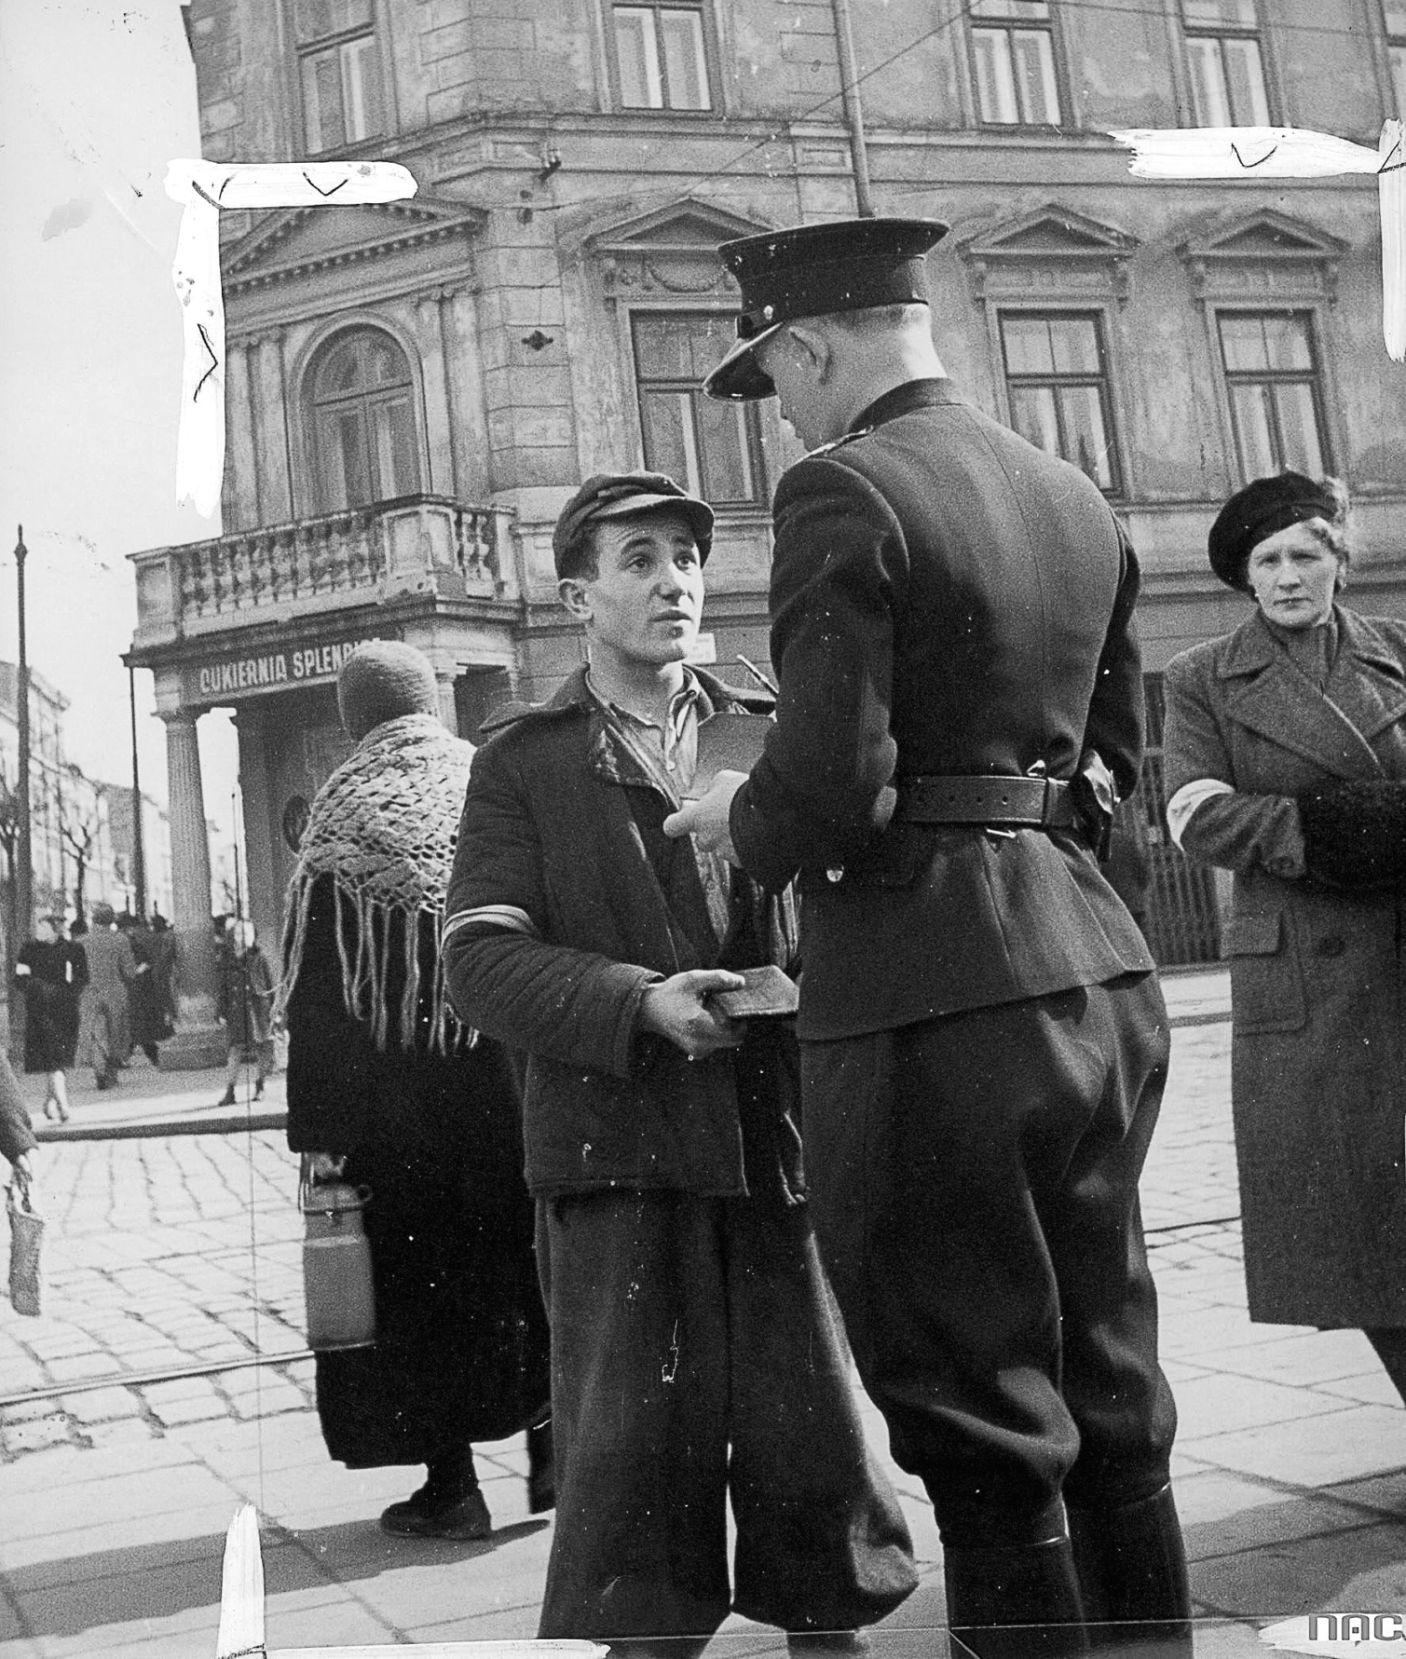 Polish police officer checks Jewish man's documents, Krakow Ghetto, 1941. (Polish National Archive)